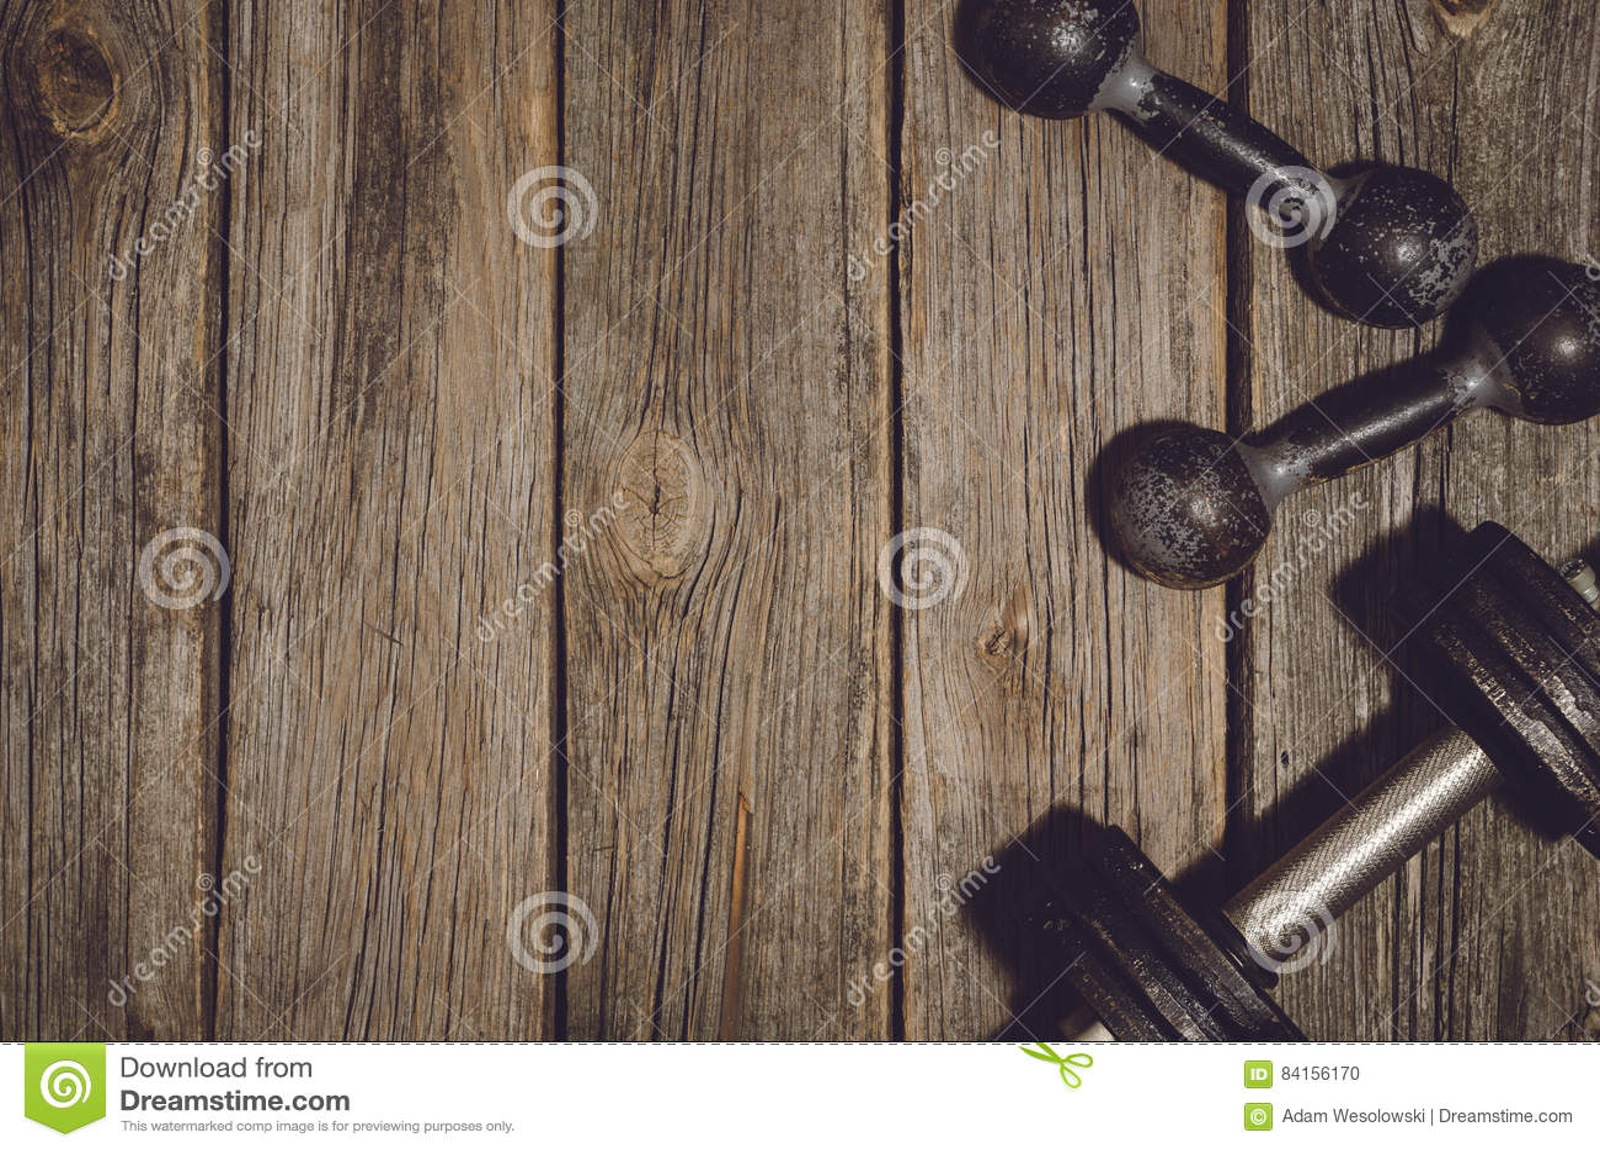 fitness workout background dumbbells on wooden gym floor